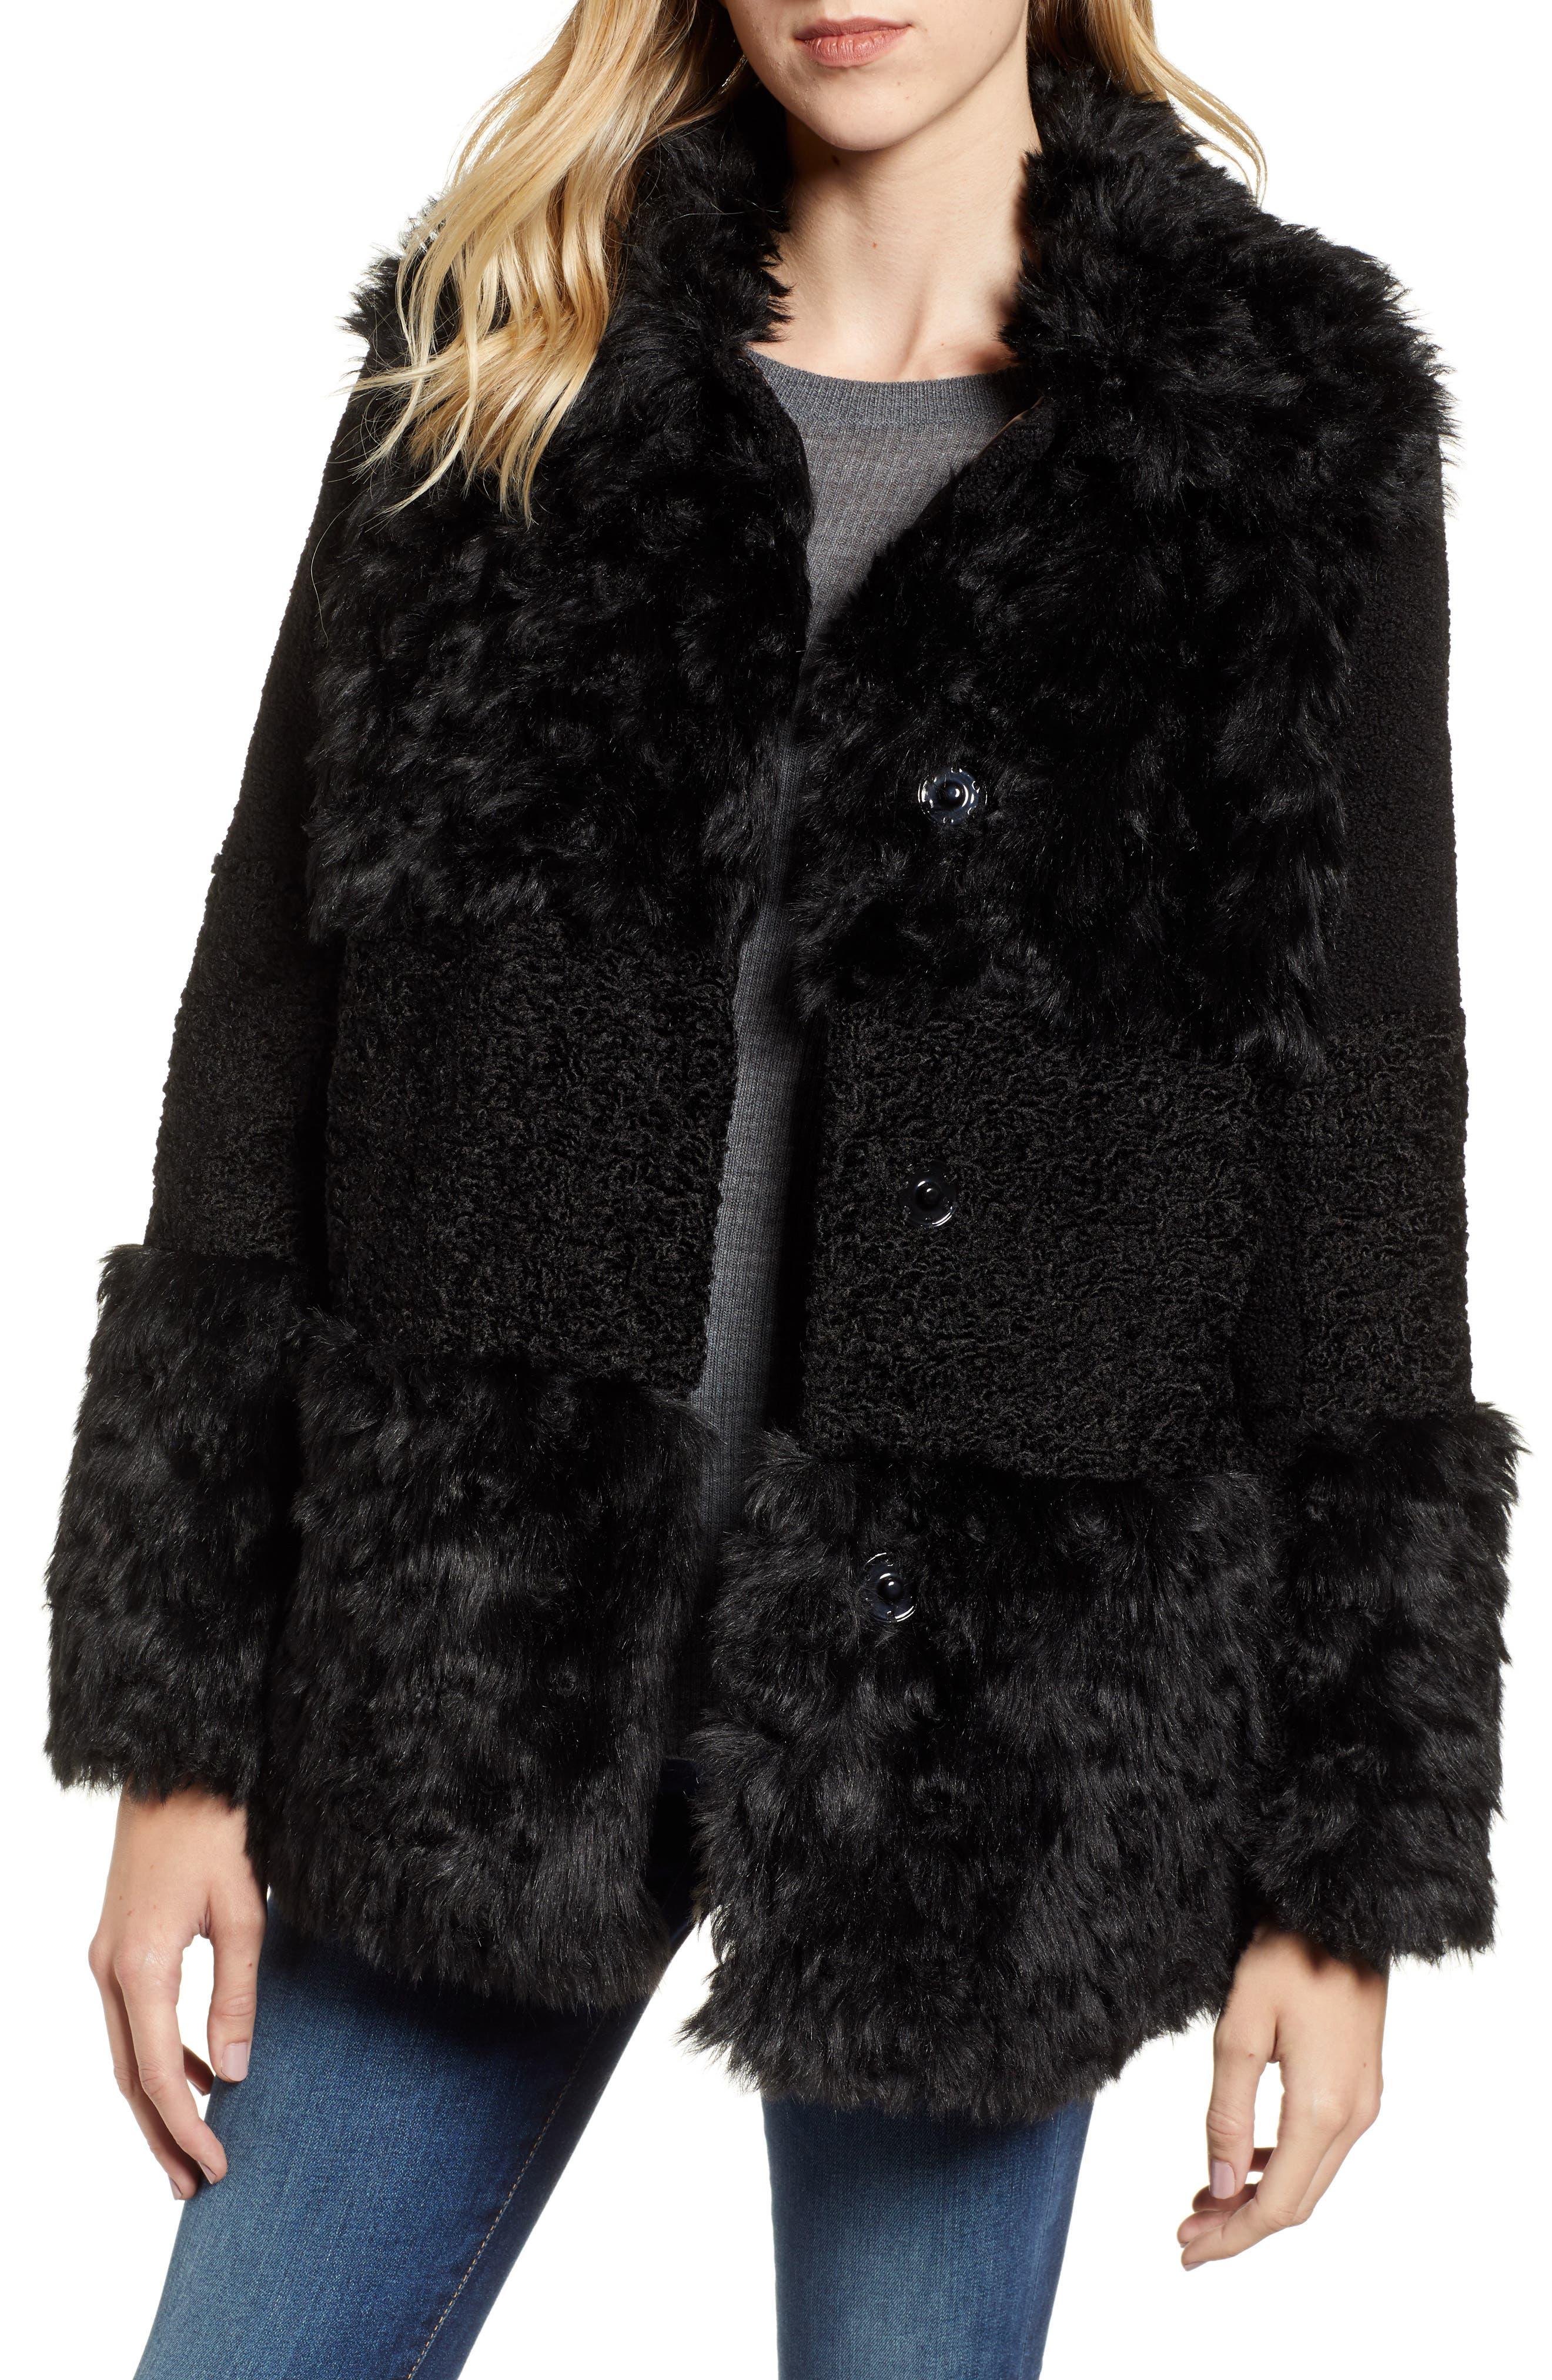 KENSIE Faux Fur Patchwork Coat, Main, color, 001